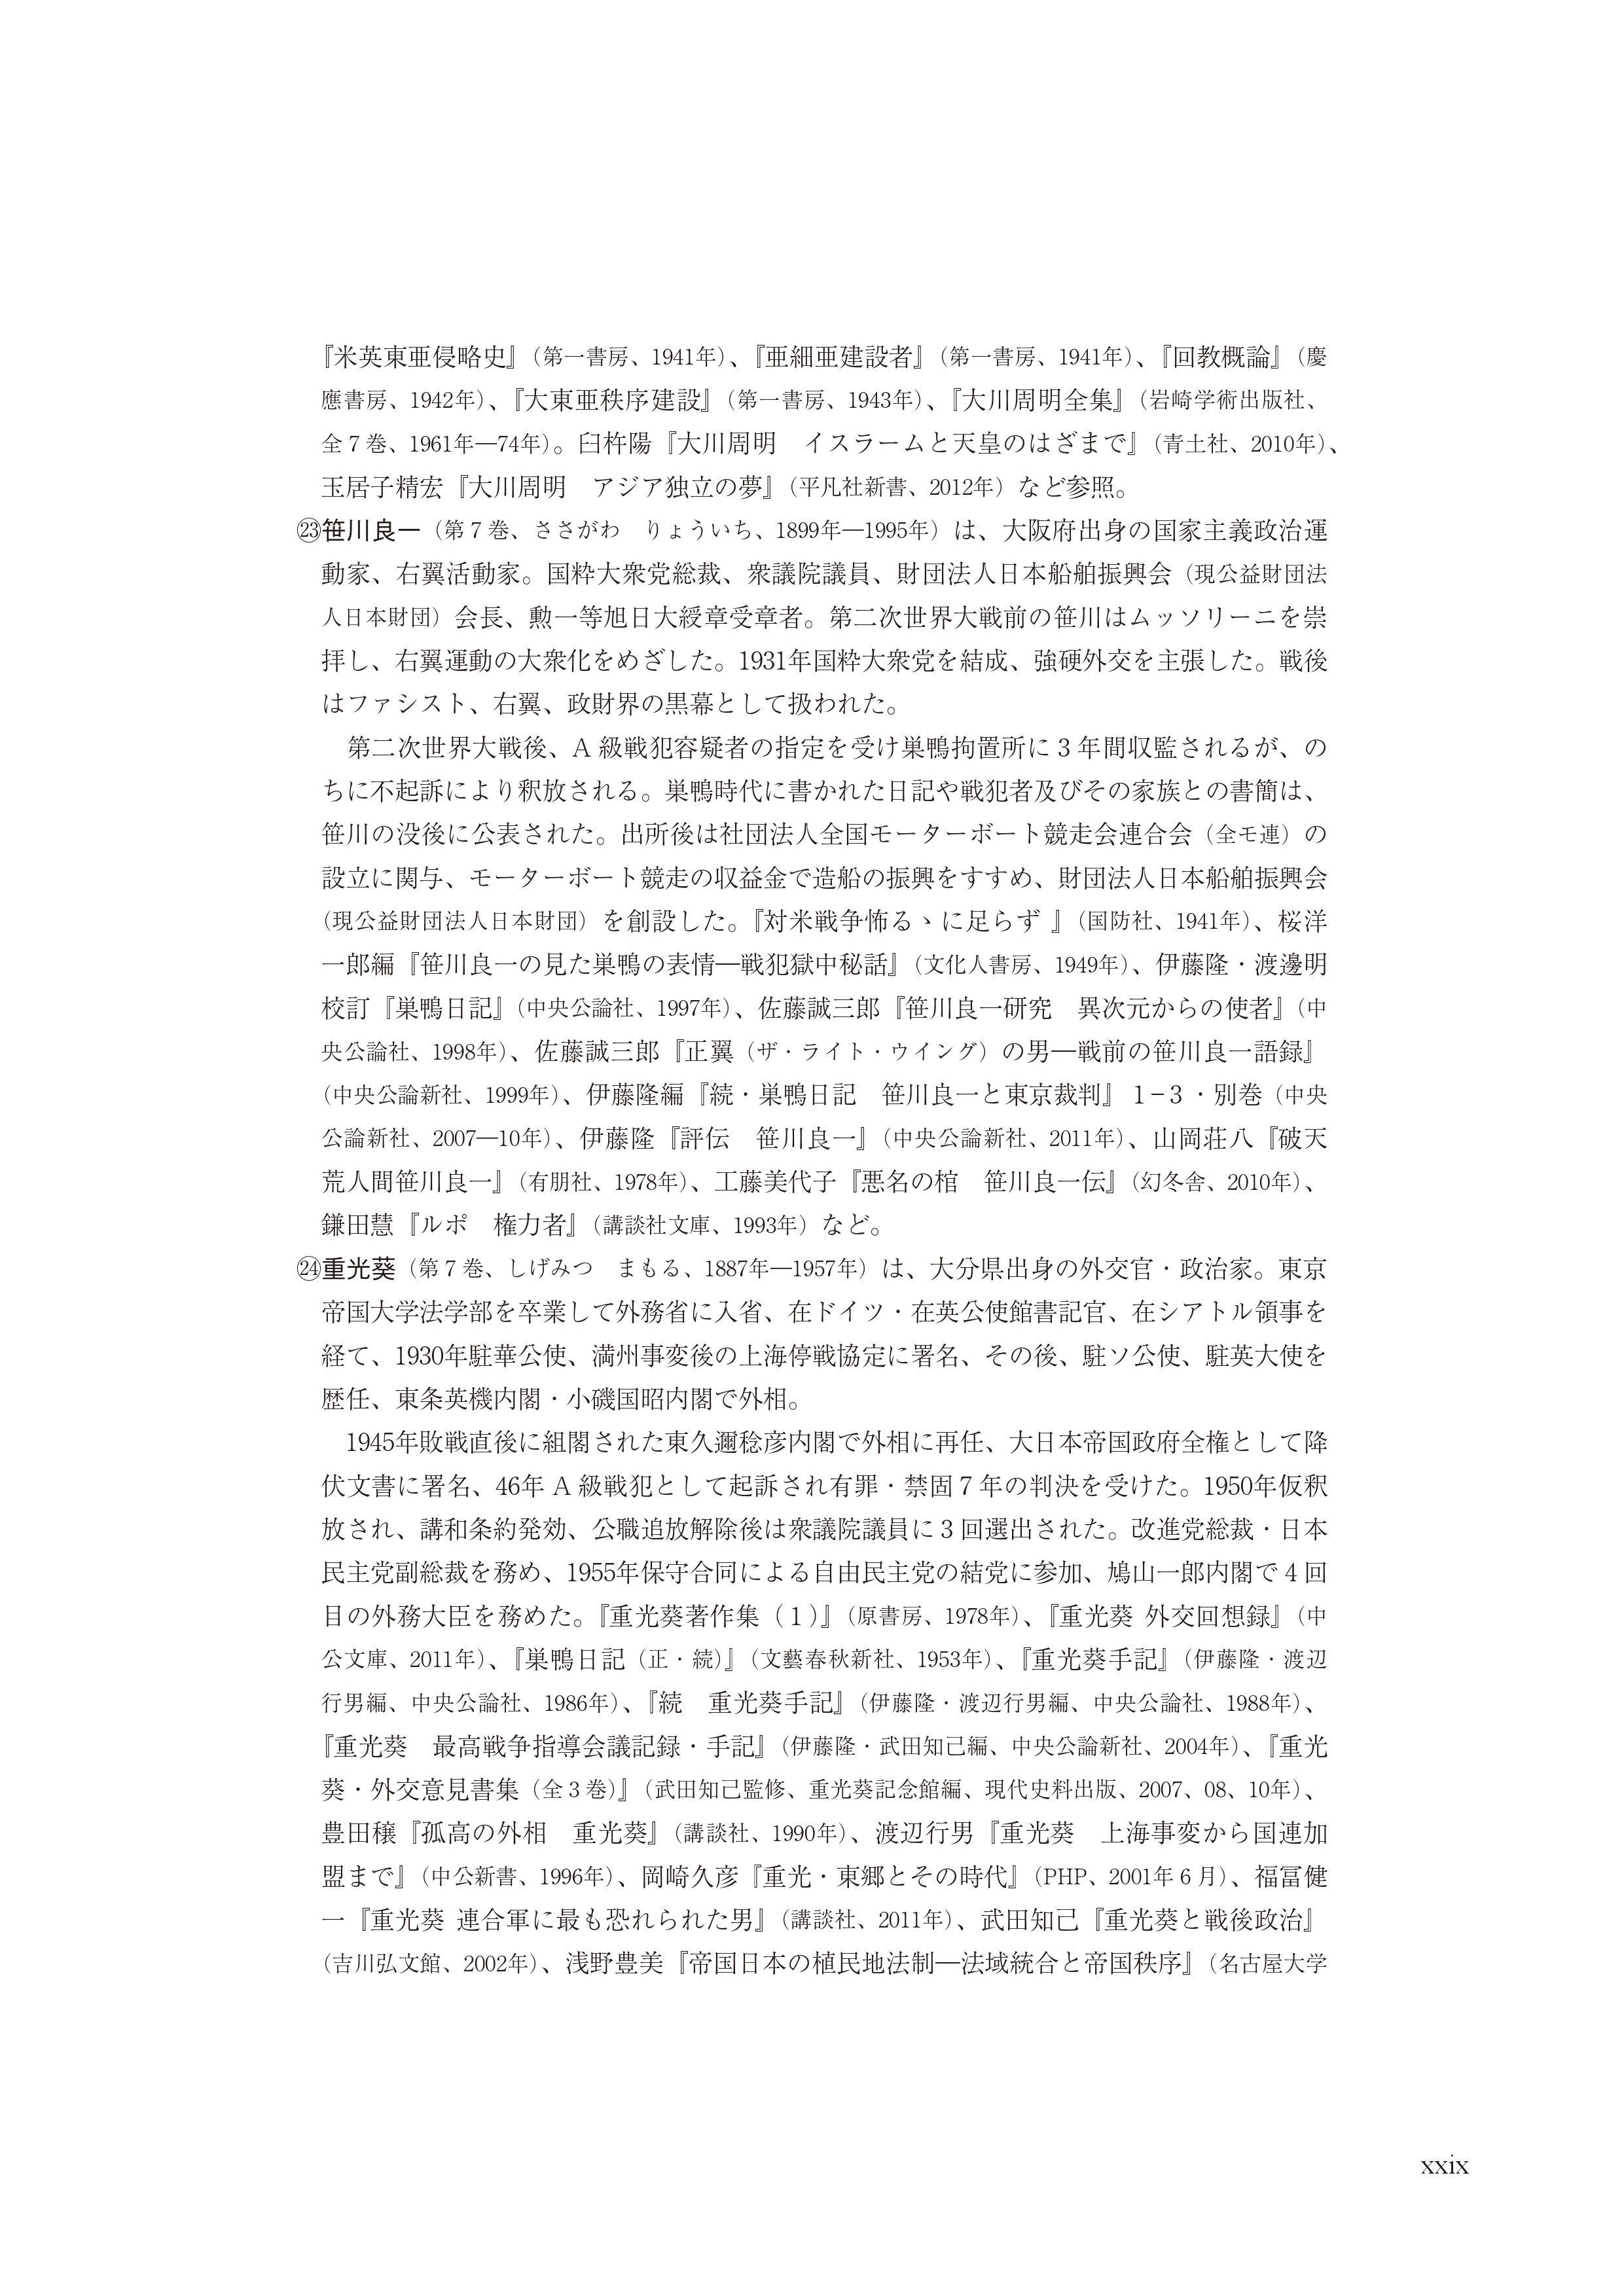 CIA日本人ファイル0001 (29)